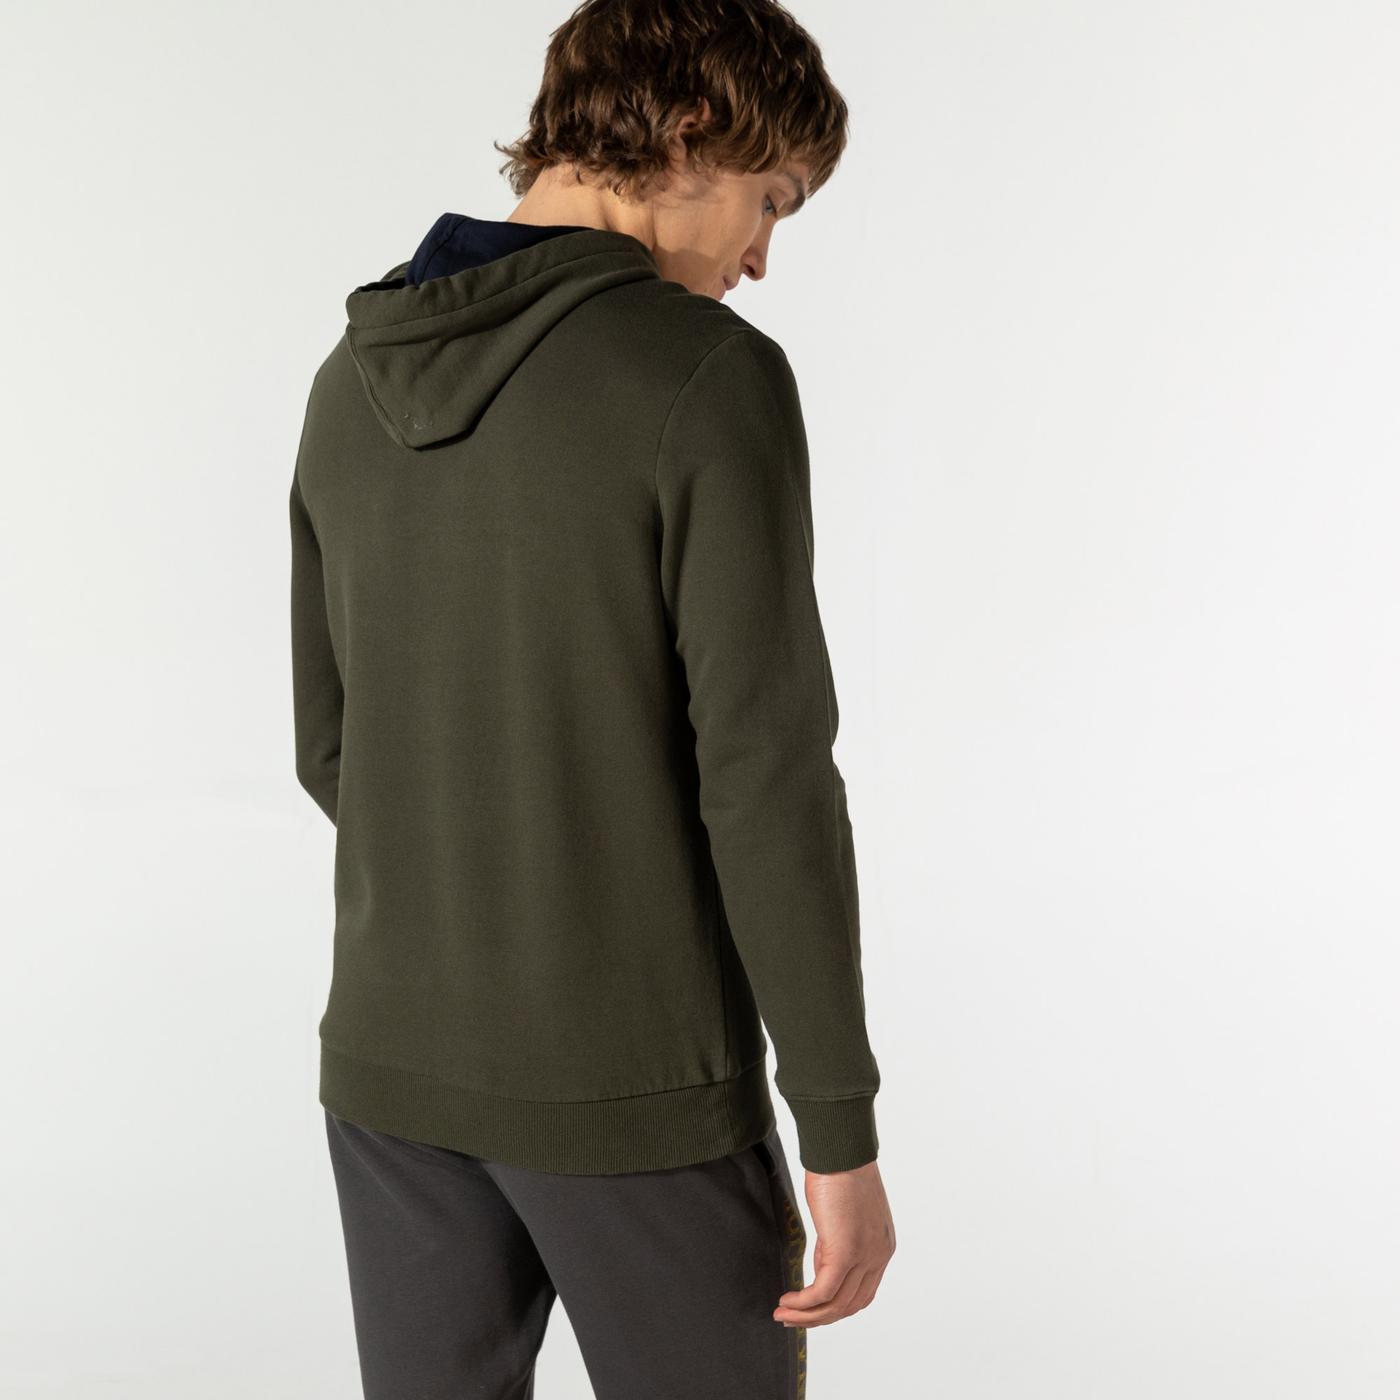 Napapijri Erkek Yeşil Sweatshirt